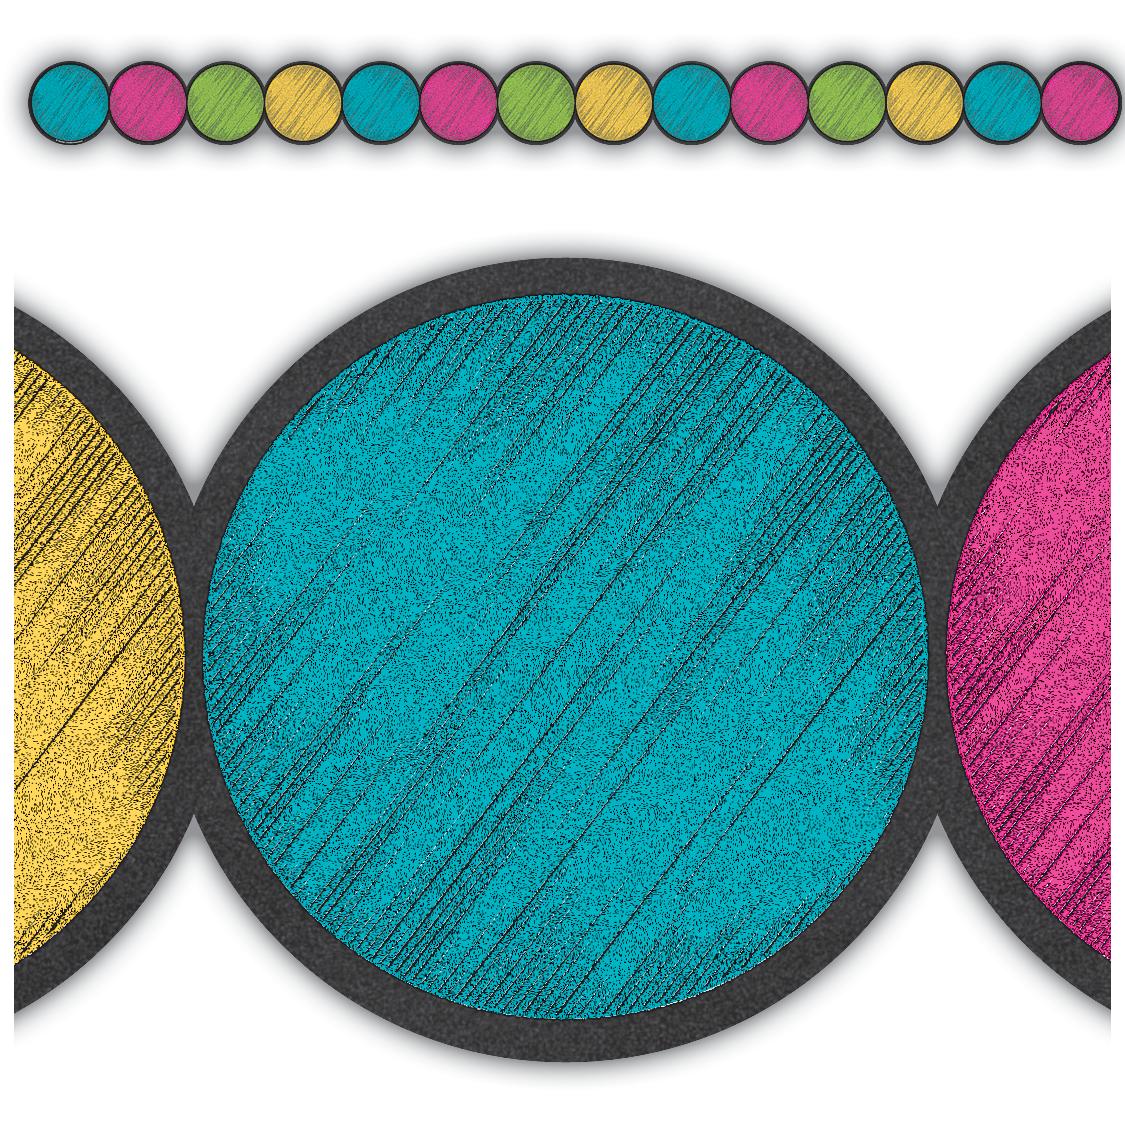 Chalkboard Brights Circles Die-Cut Border Trim   Pinterest ...